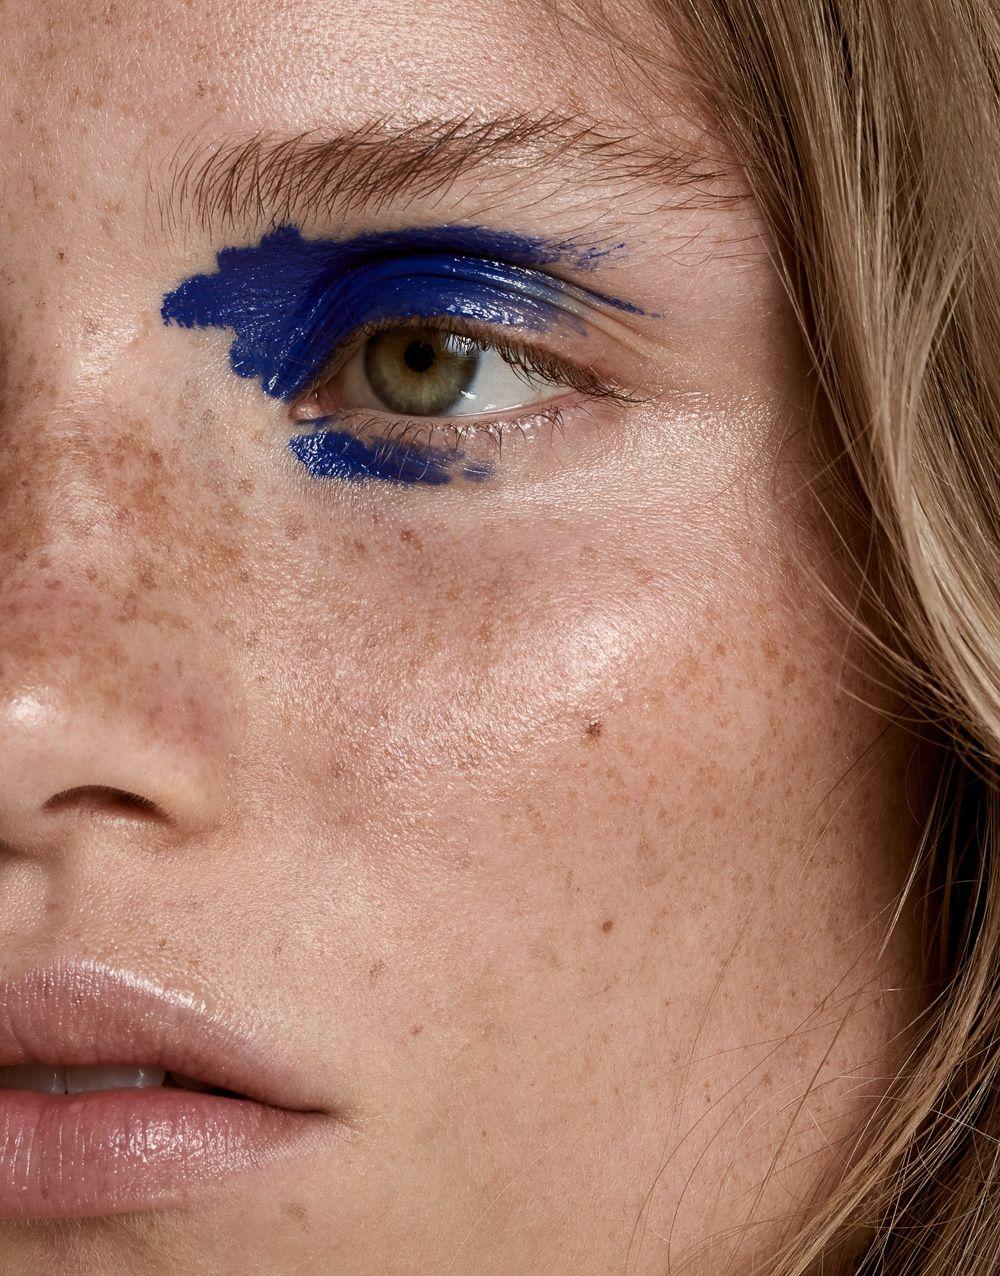 Vogue Italy August 2017 Rebecca Longendyke By Andreas Ortner